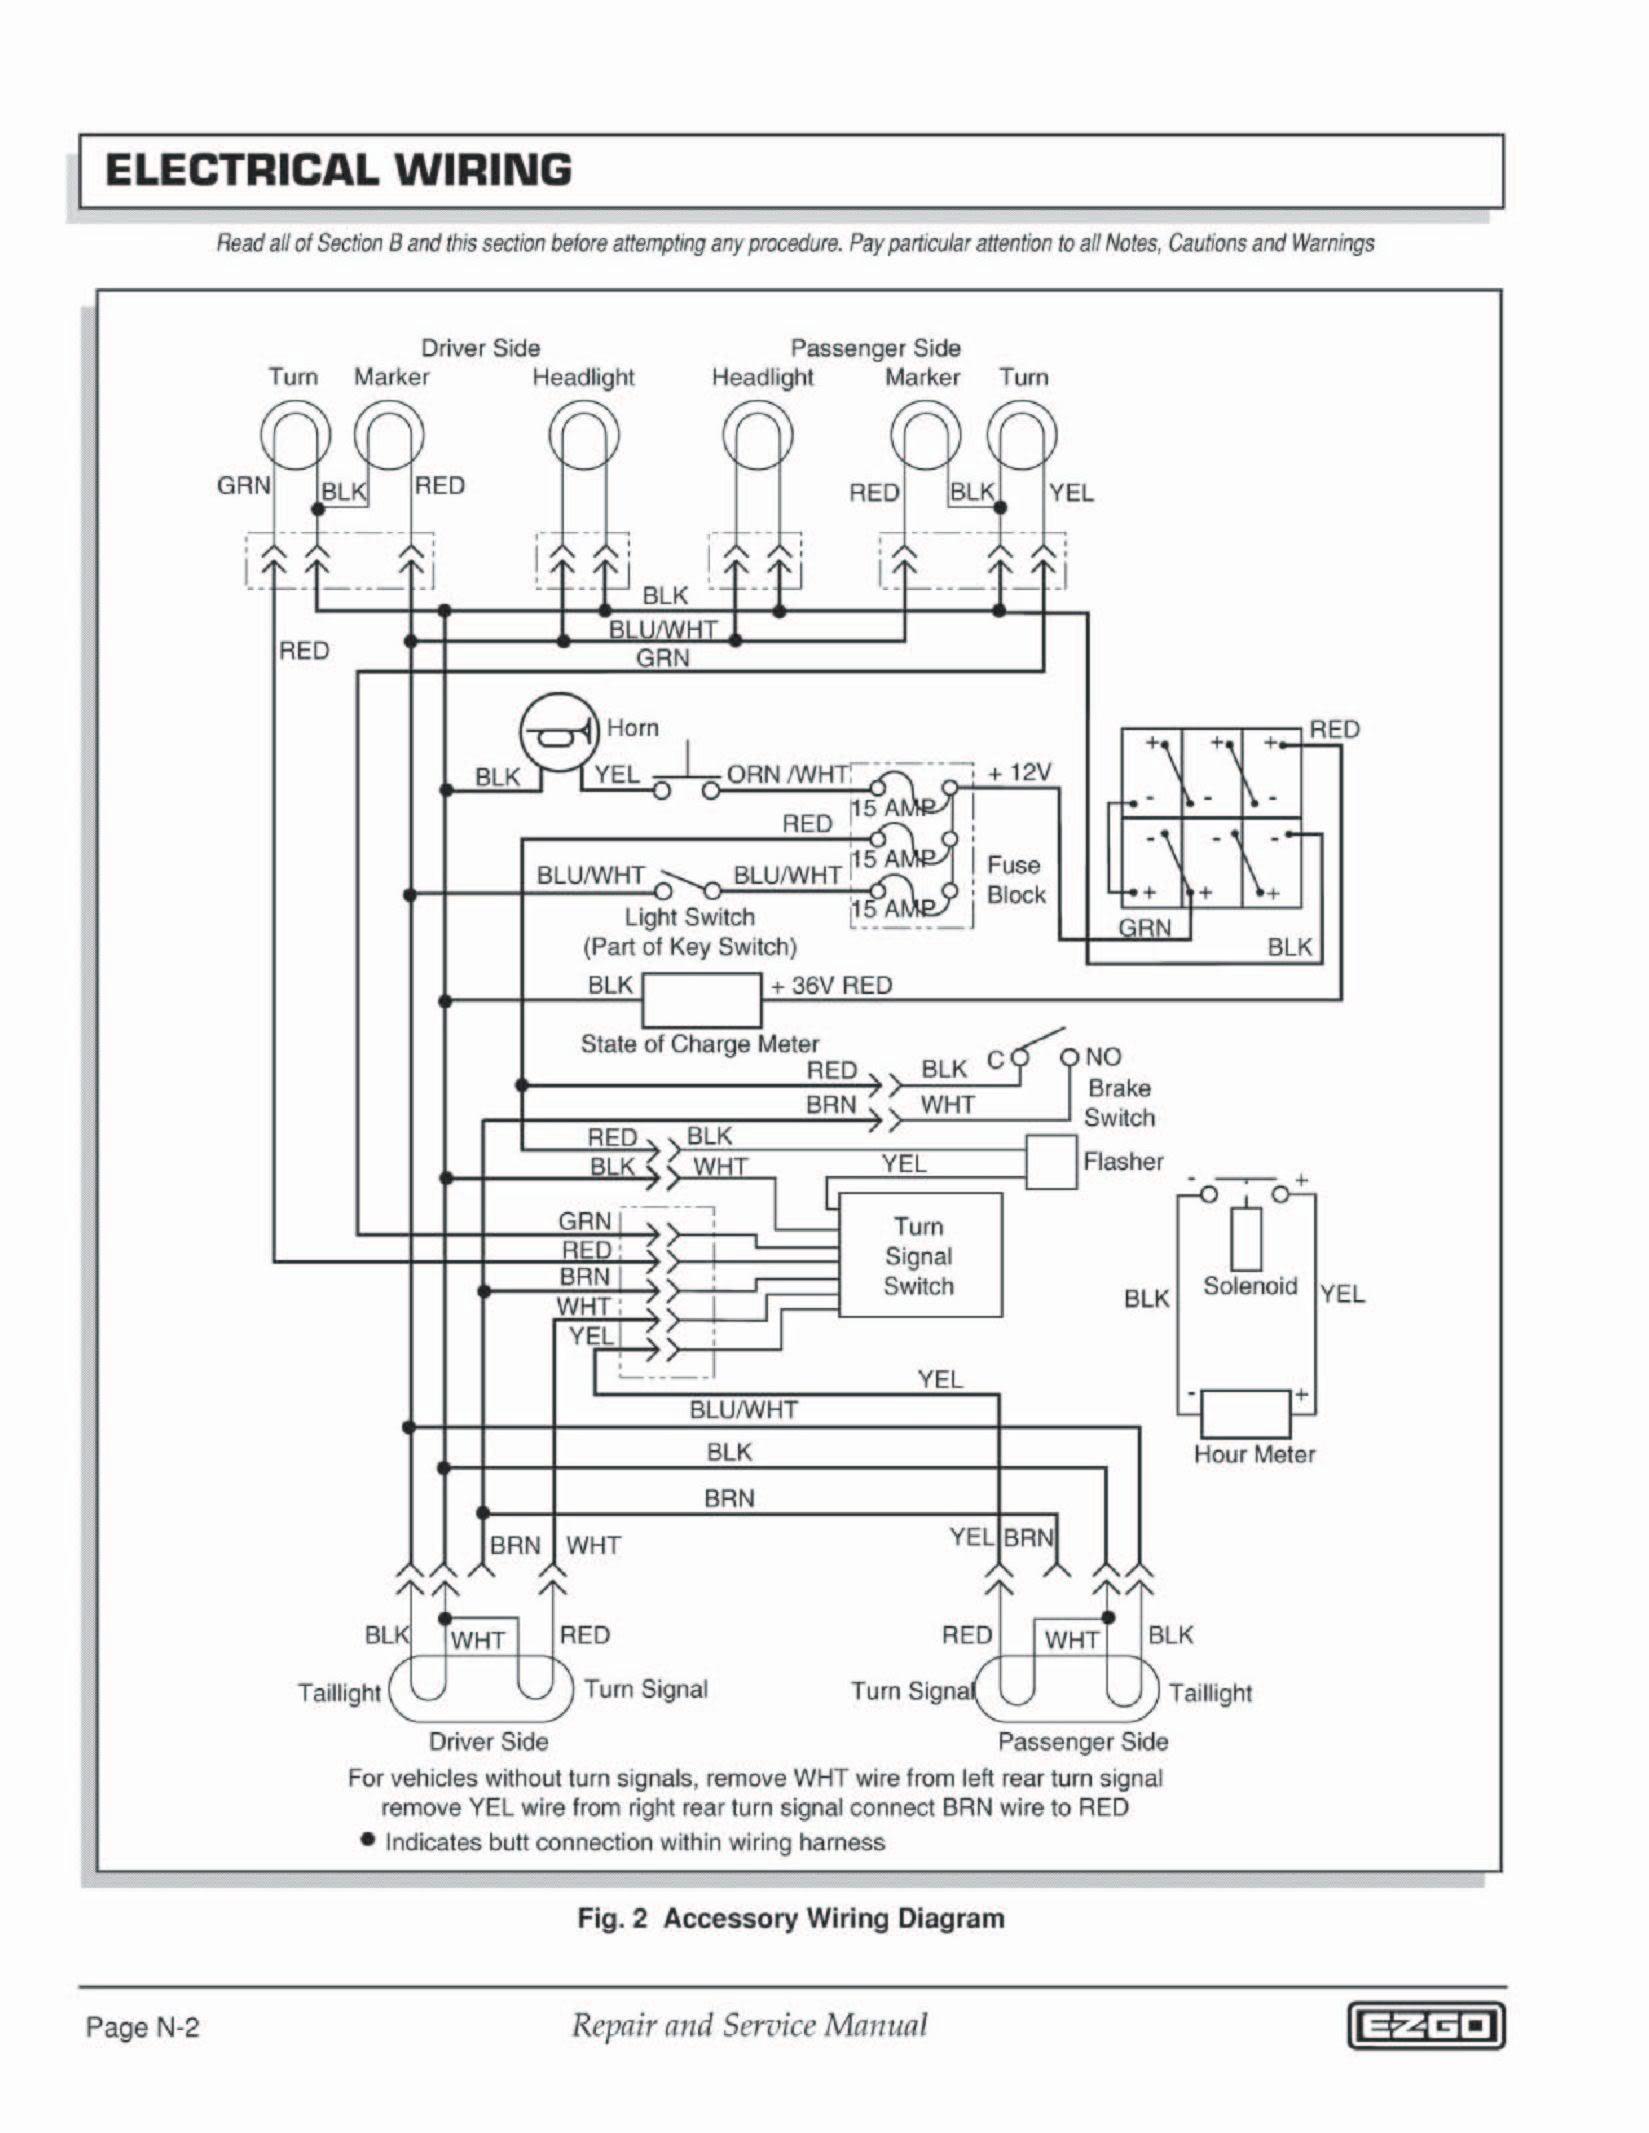 ezgo txt key switch wiring diagram inspirationa luxury 1998 ez go rh acousticguitarguide org EZ Go Solenoid Wiring Diagram 2001 EZ Go TXT Wiring Diagram